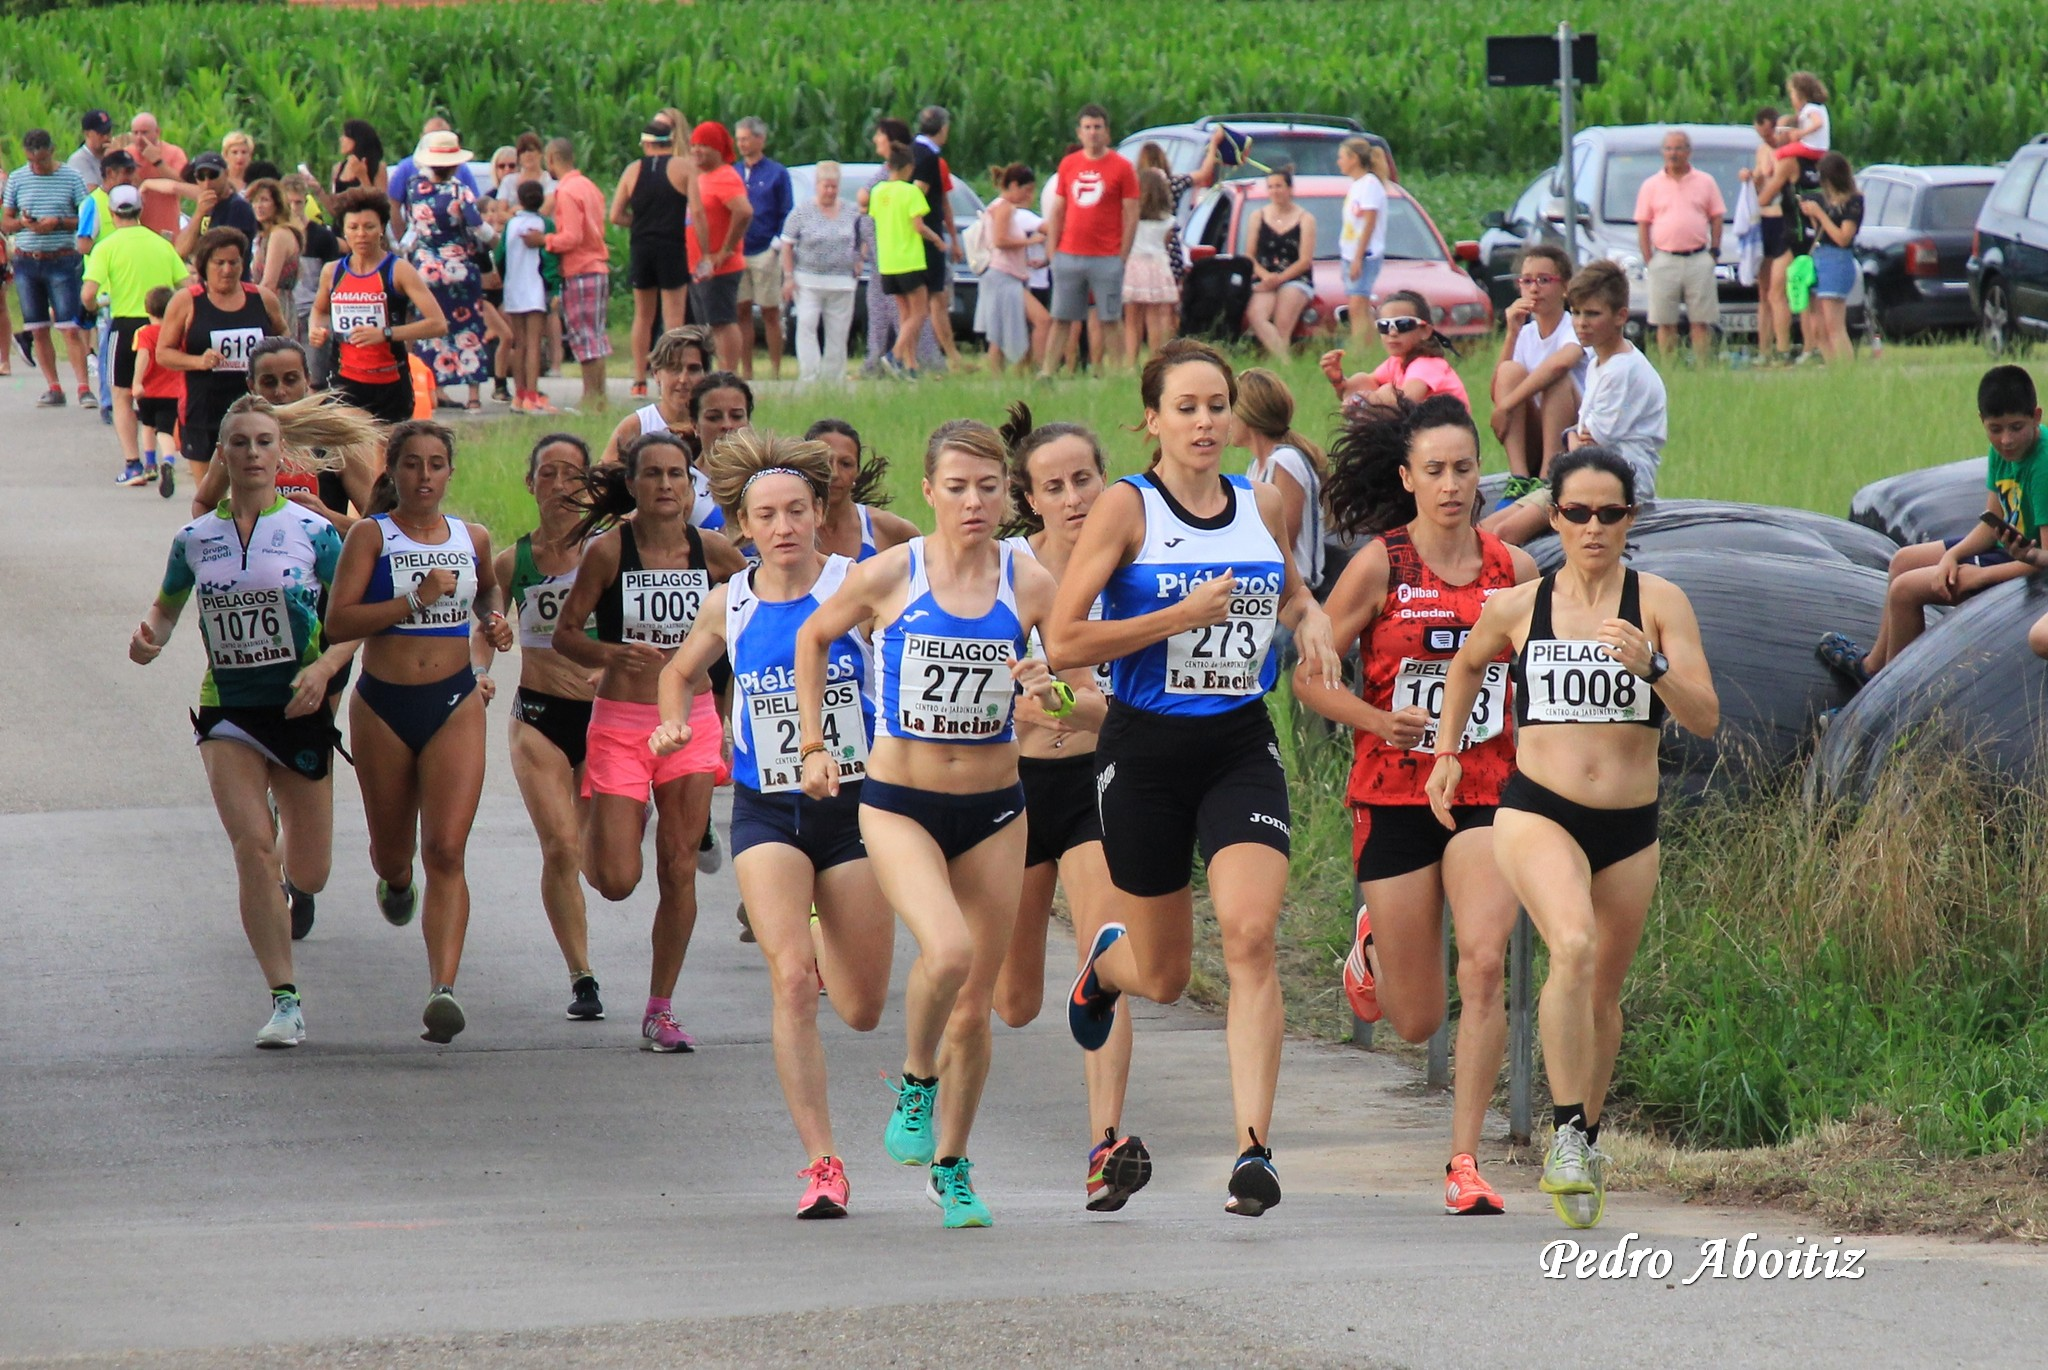 2019-07-16 XII Carrera Popular Zurita de Piélagos 152